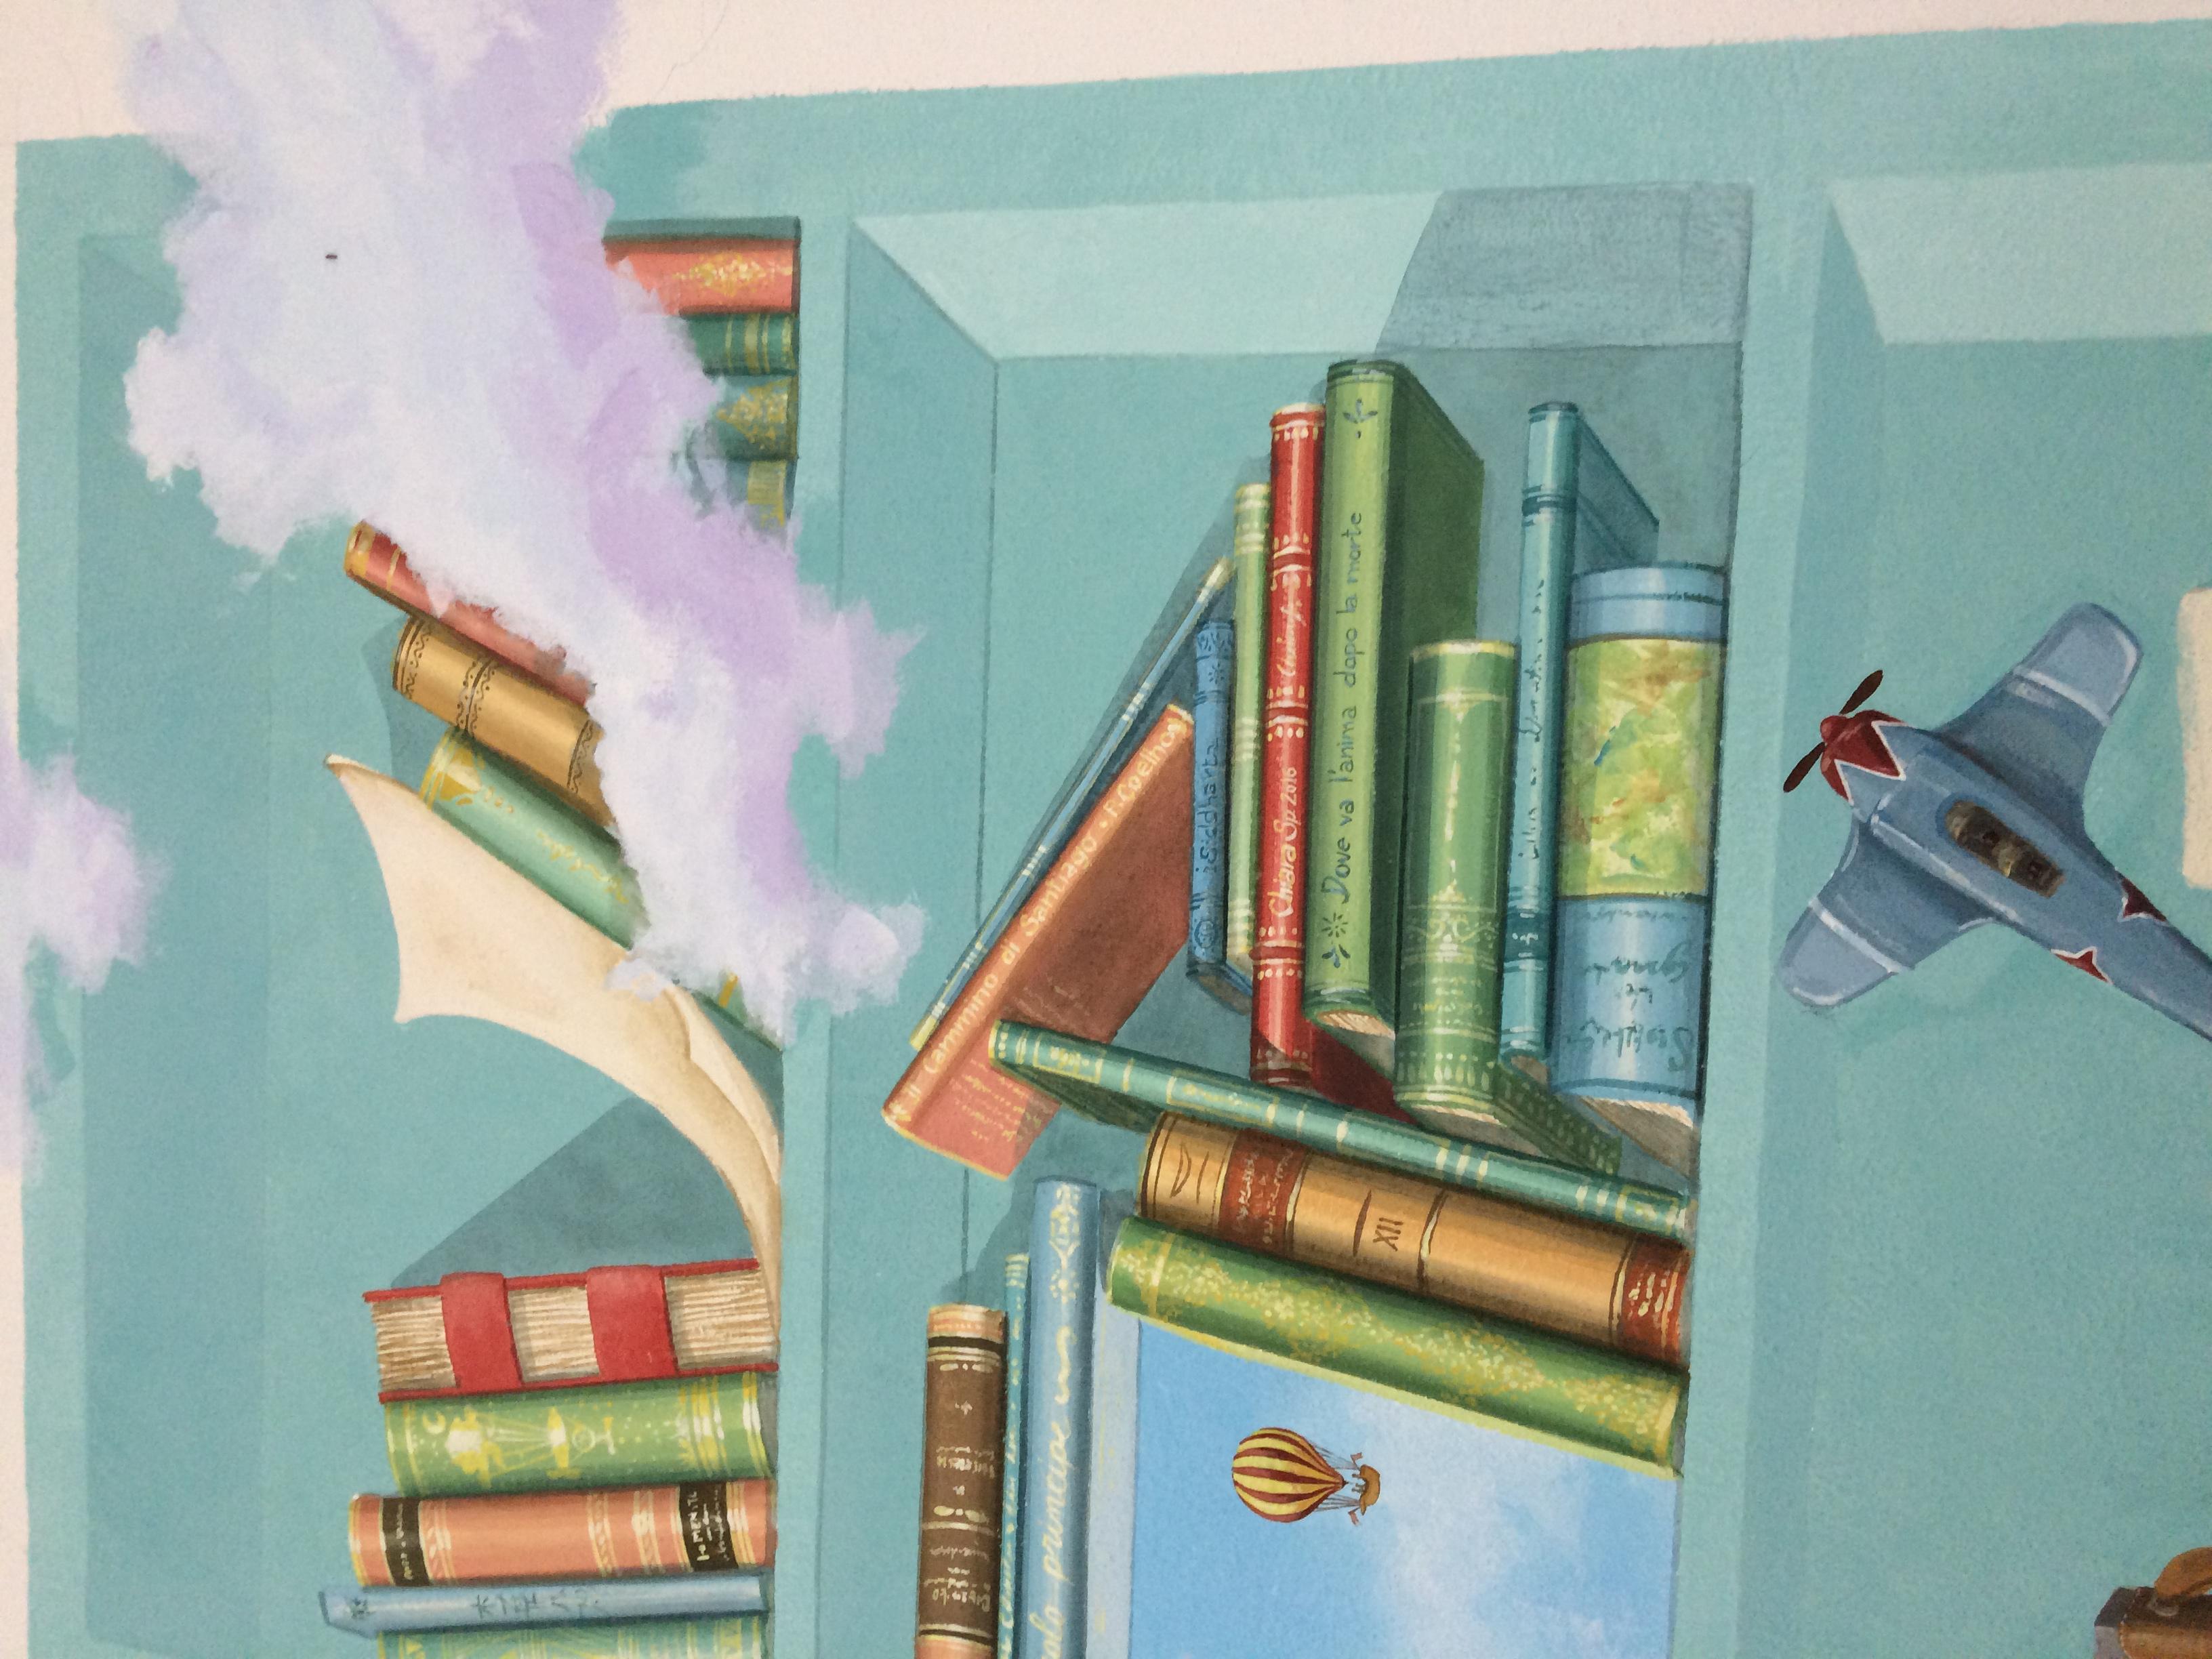 libreria Volante, Cesenatico 2018